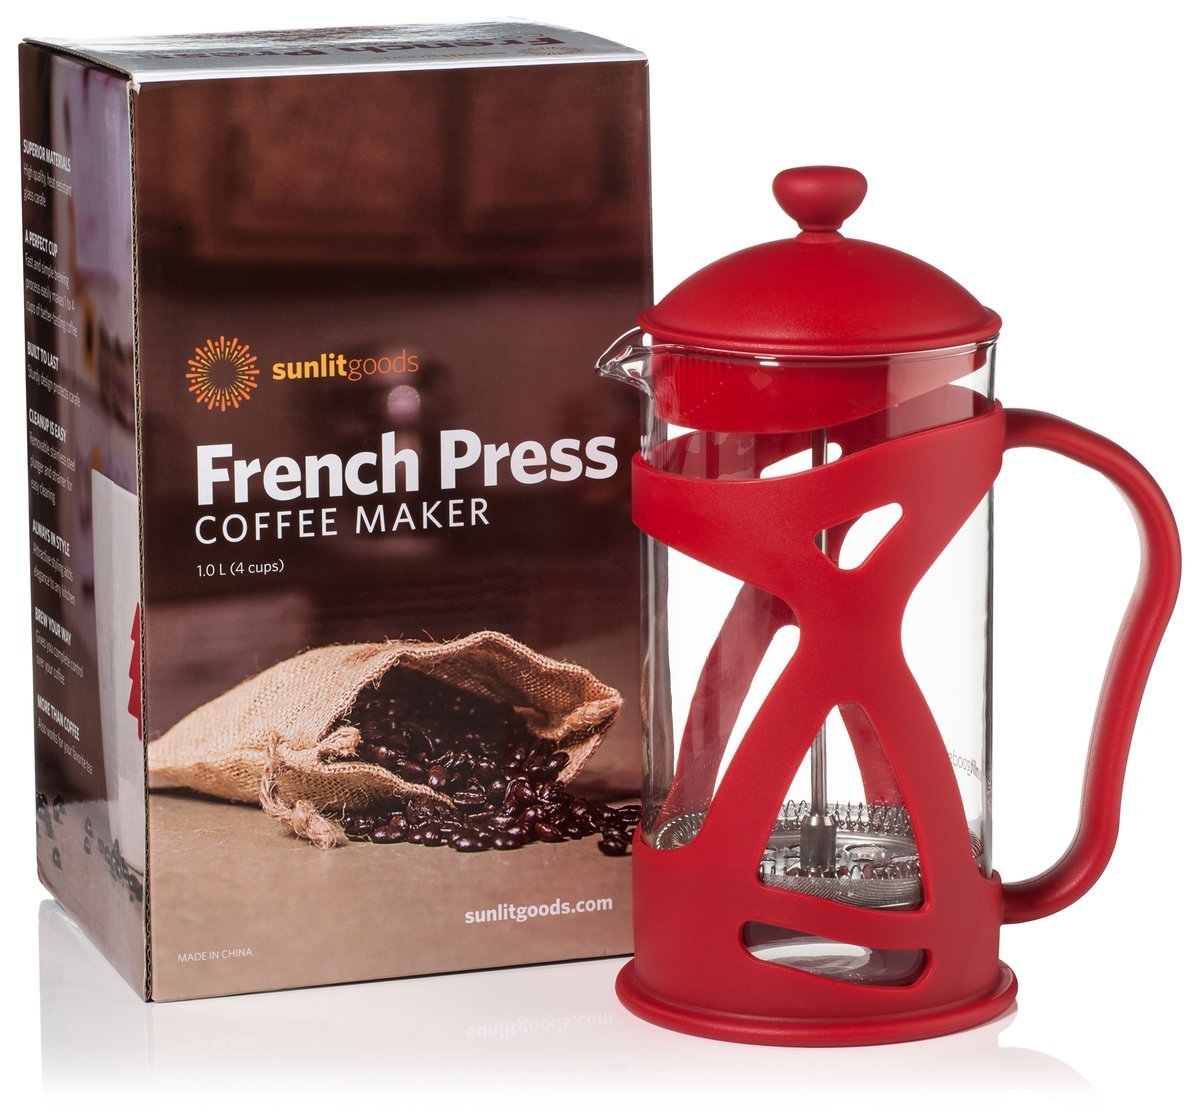 French Press Coffee & Loose Leaf Tea Maker, Red (8 Cup, 34 oz, 4 Mug), Heat-Resistant Glass, Bonus Filter, Spoon by Sunlit